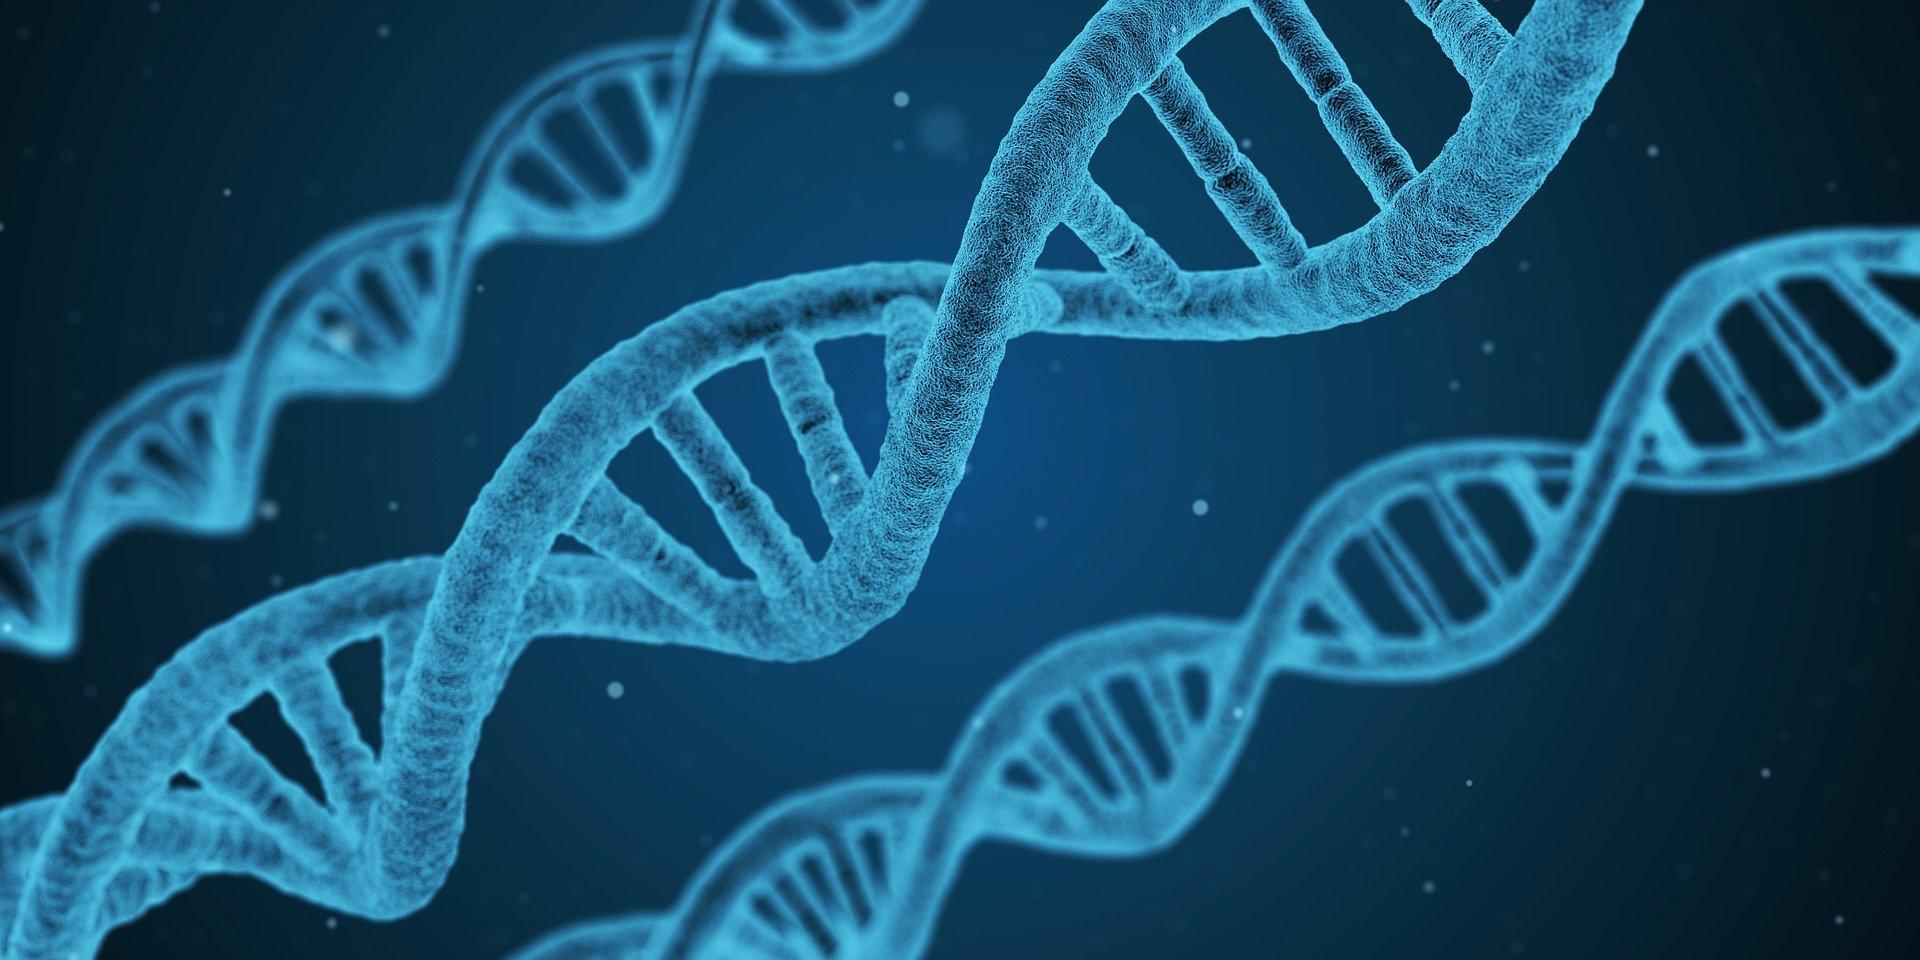 Human Limb Regrowth With Acorn Worm DNA - Human Limb Regeneration